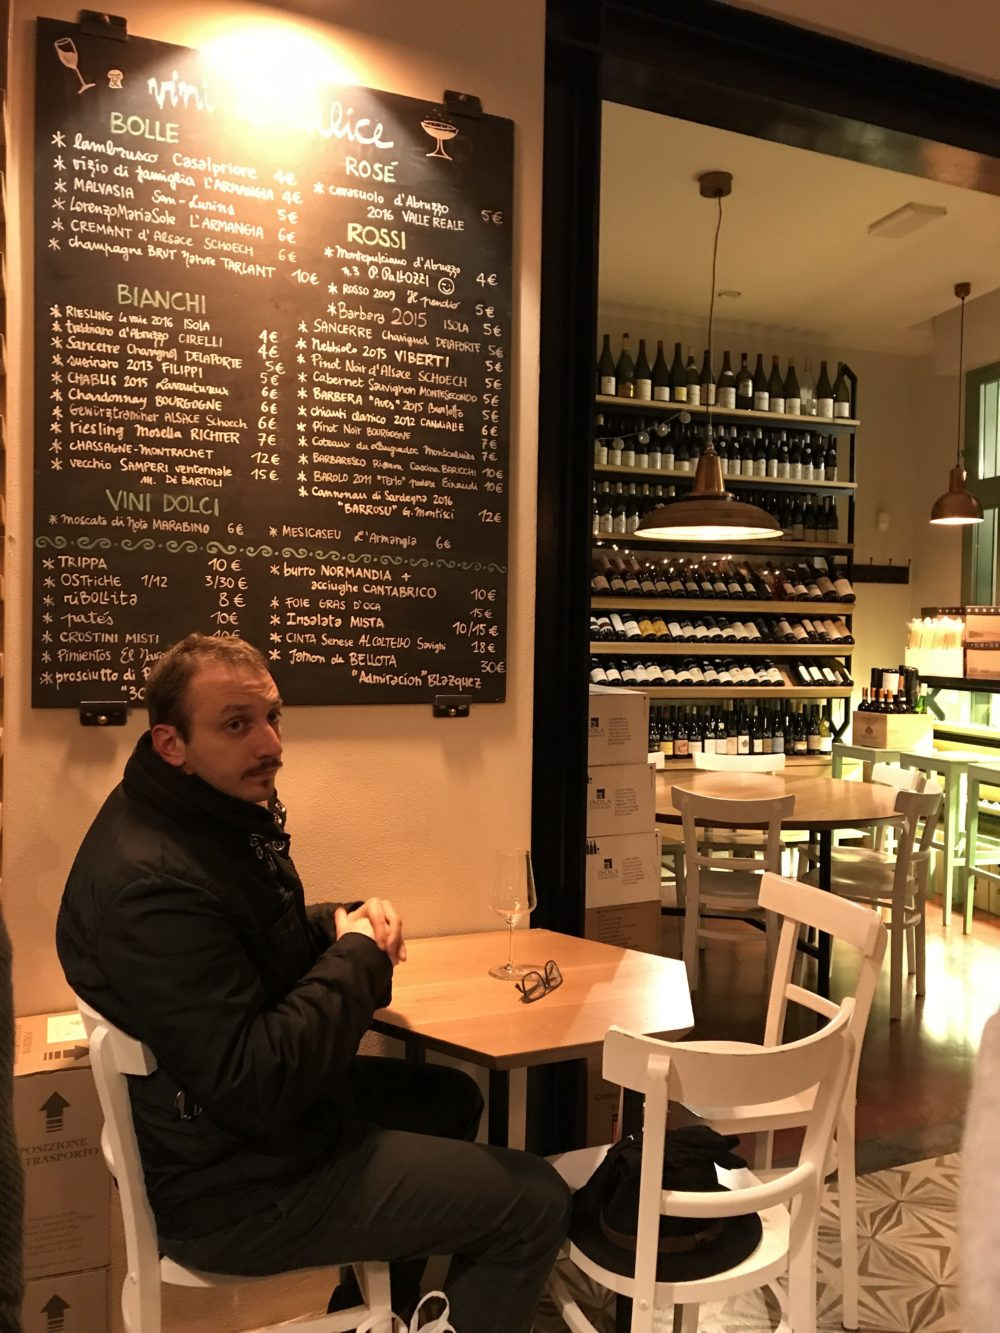 Bar betting 2000 portici bologna binary options strategies 2021 camaro